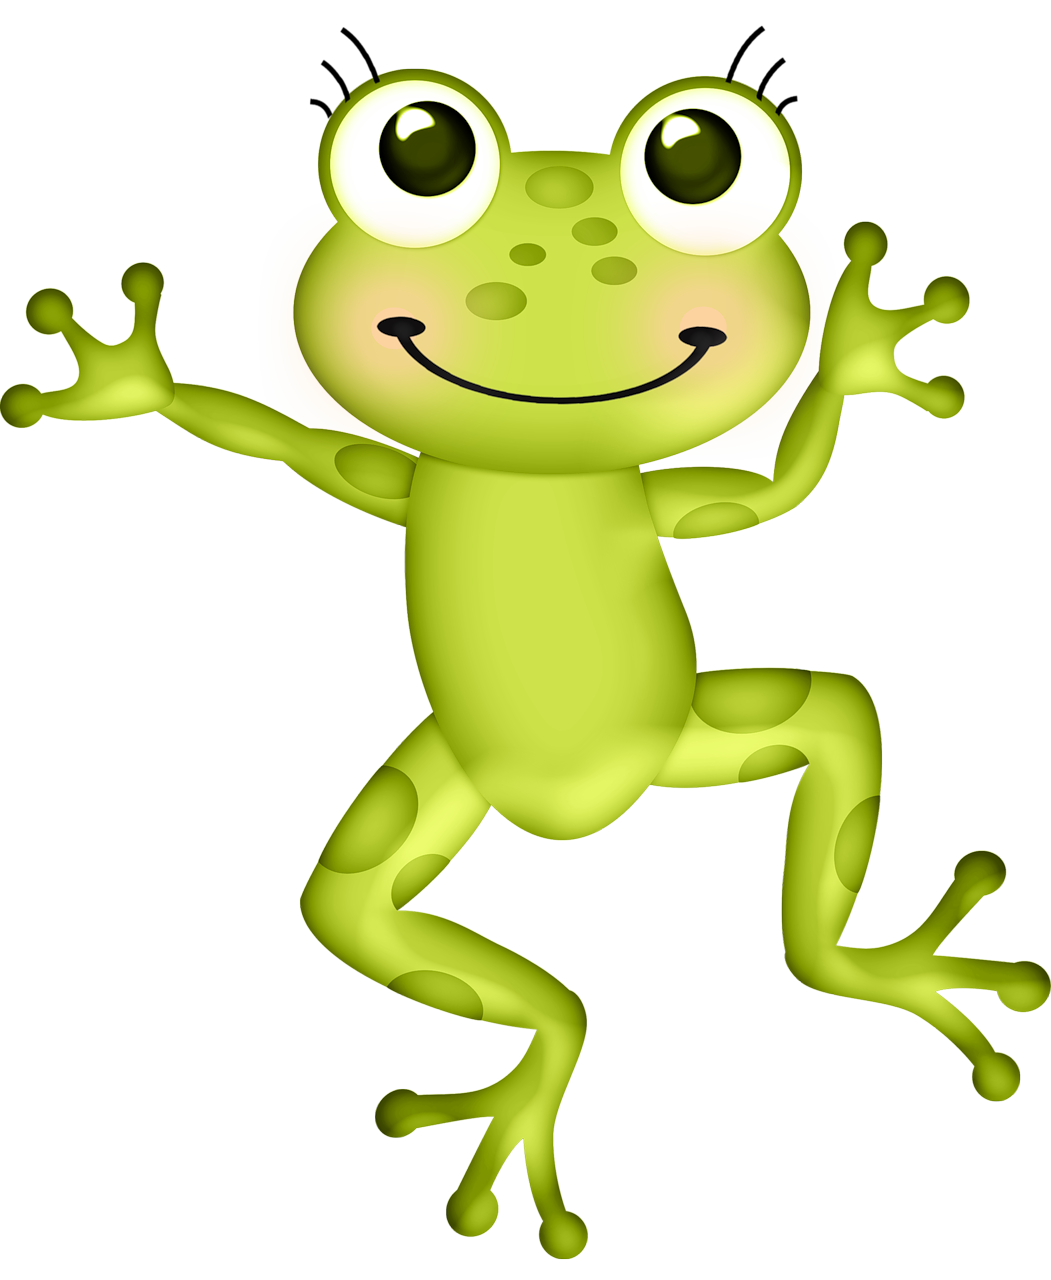 Лягушка мультяшная картинка